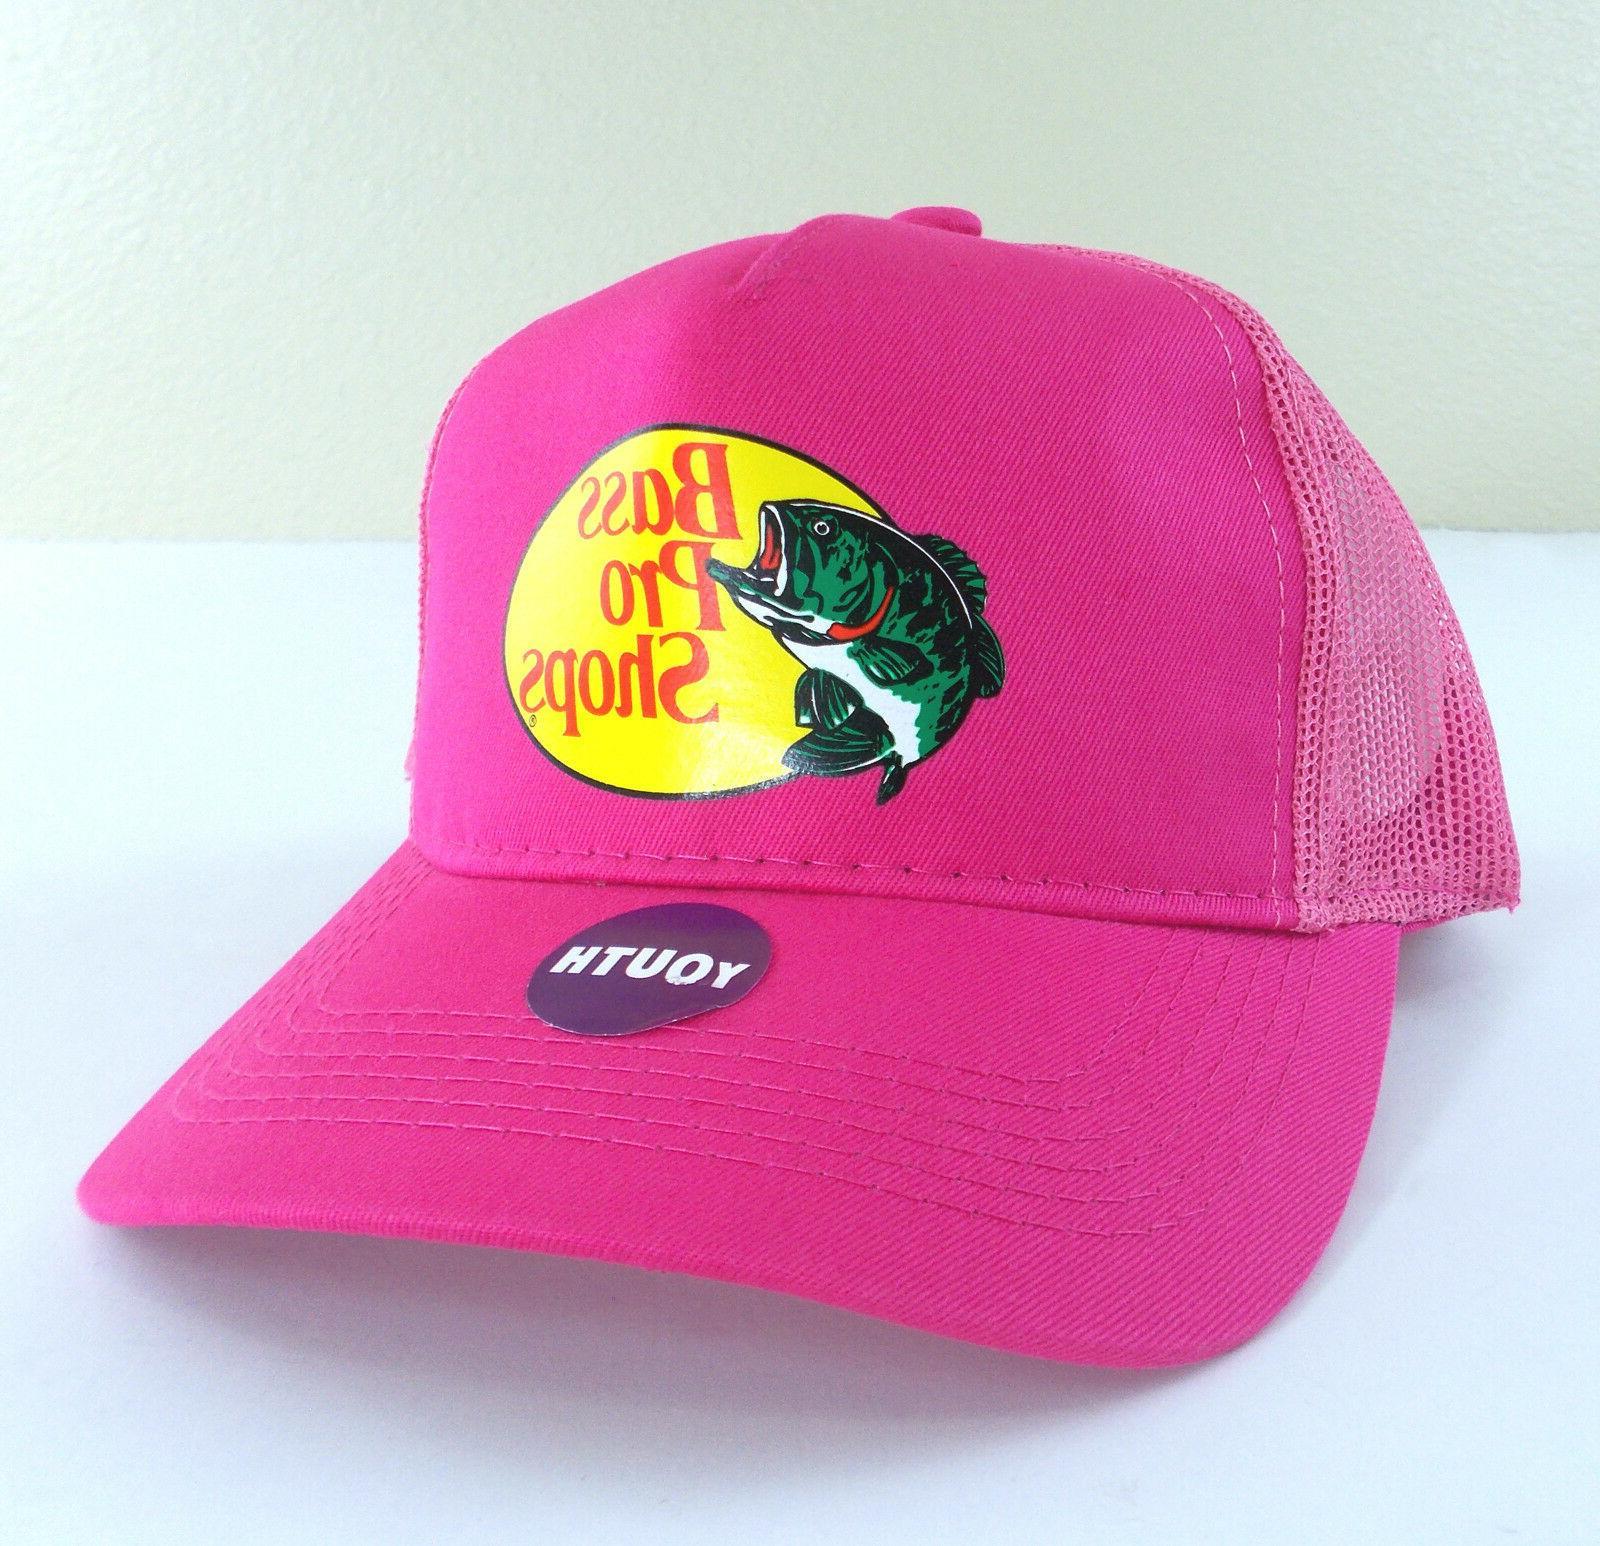 new kids trucker hats unisex youth snap